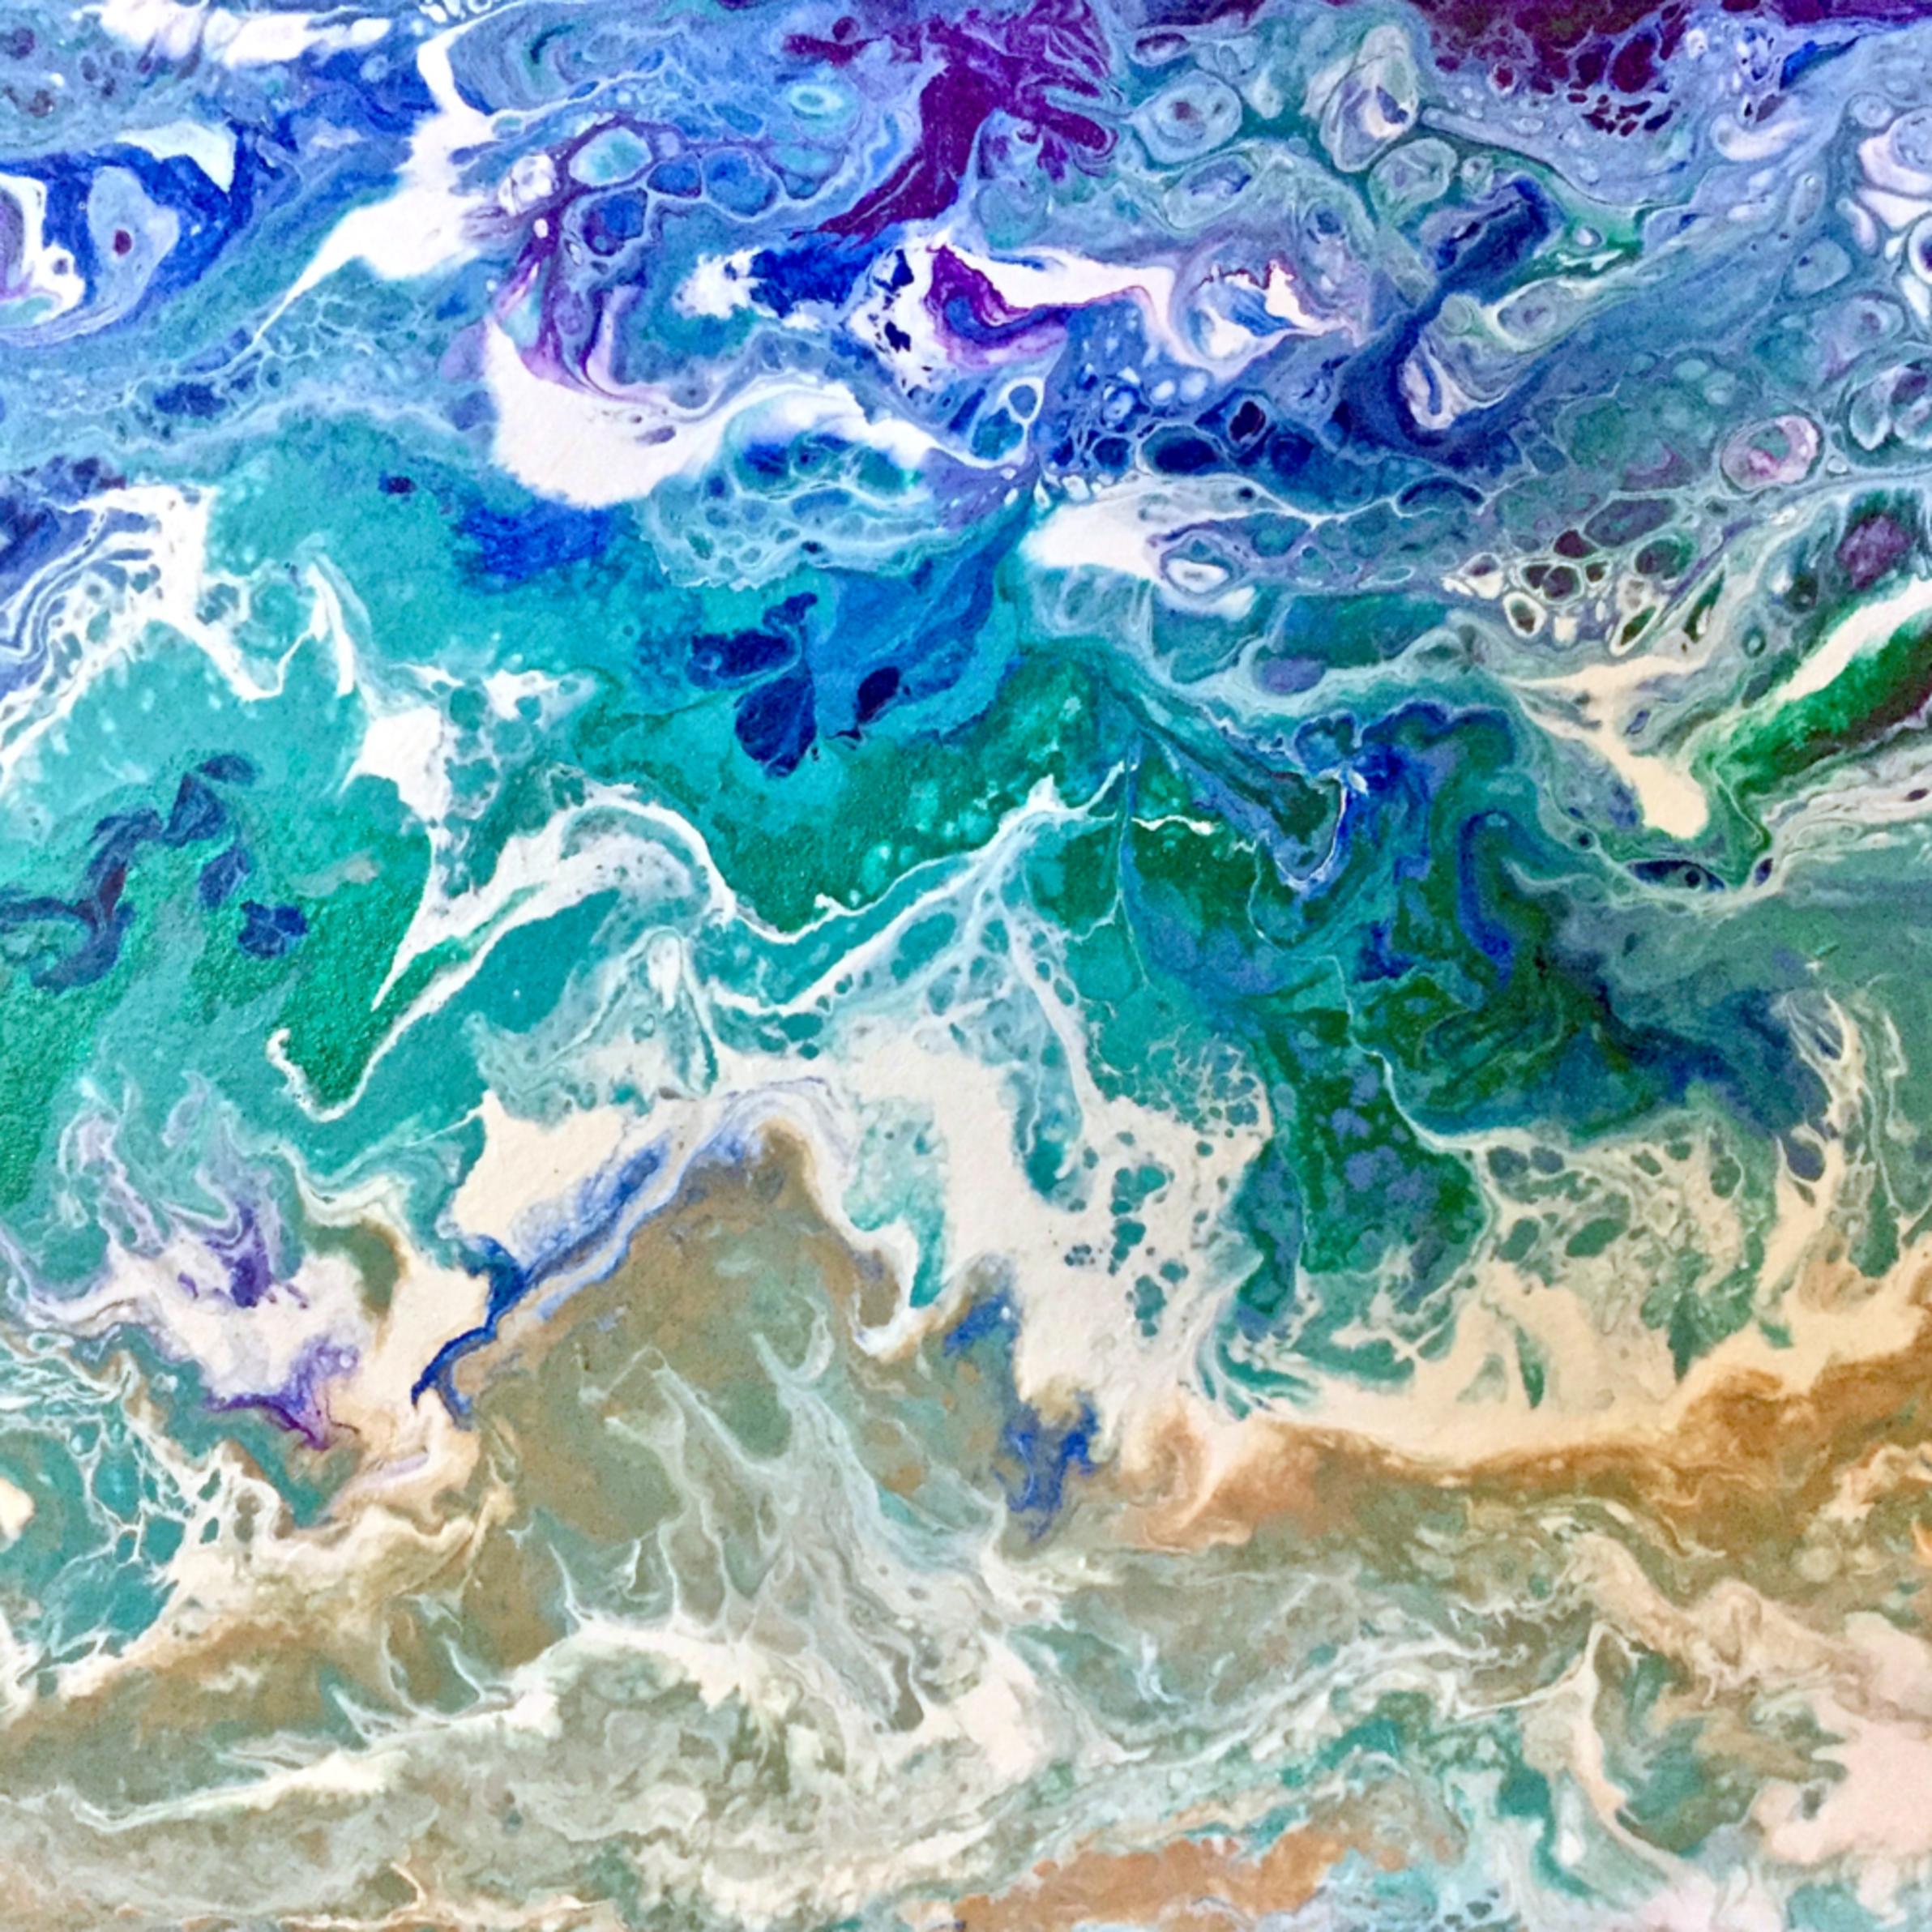 Incoming tide qrrmvr